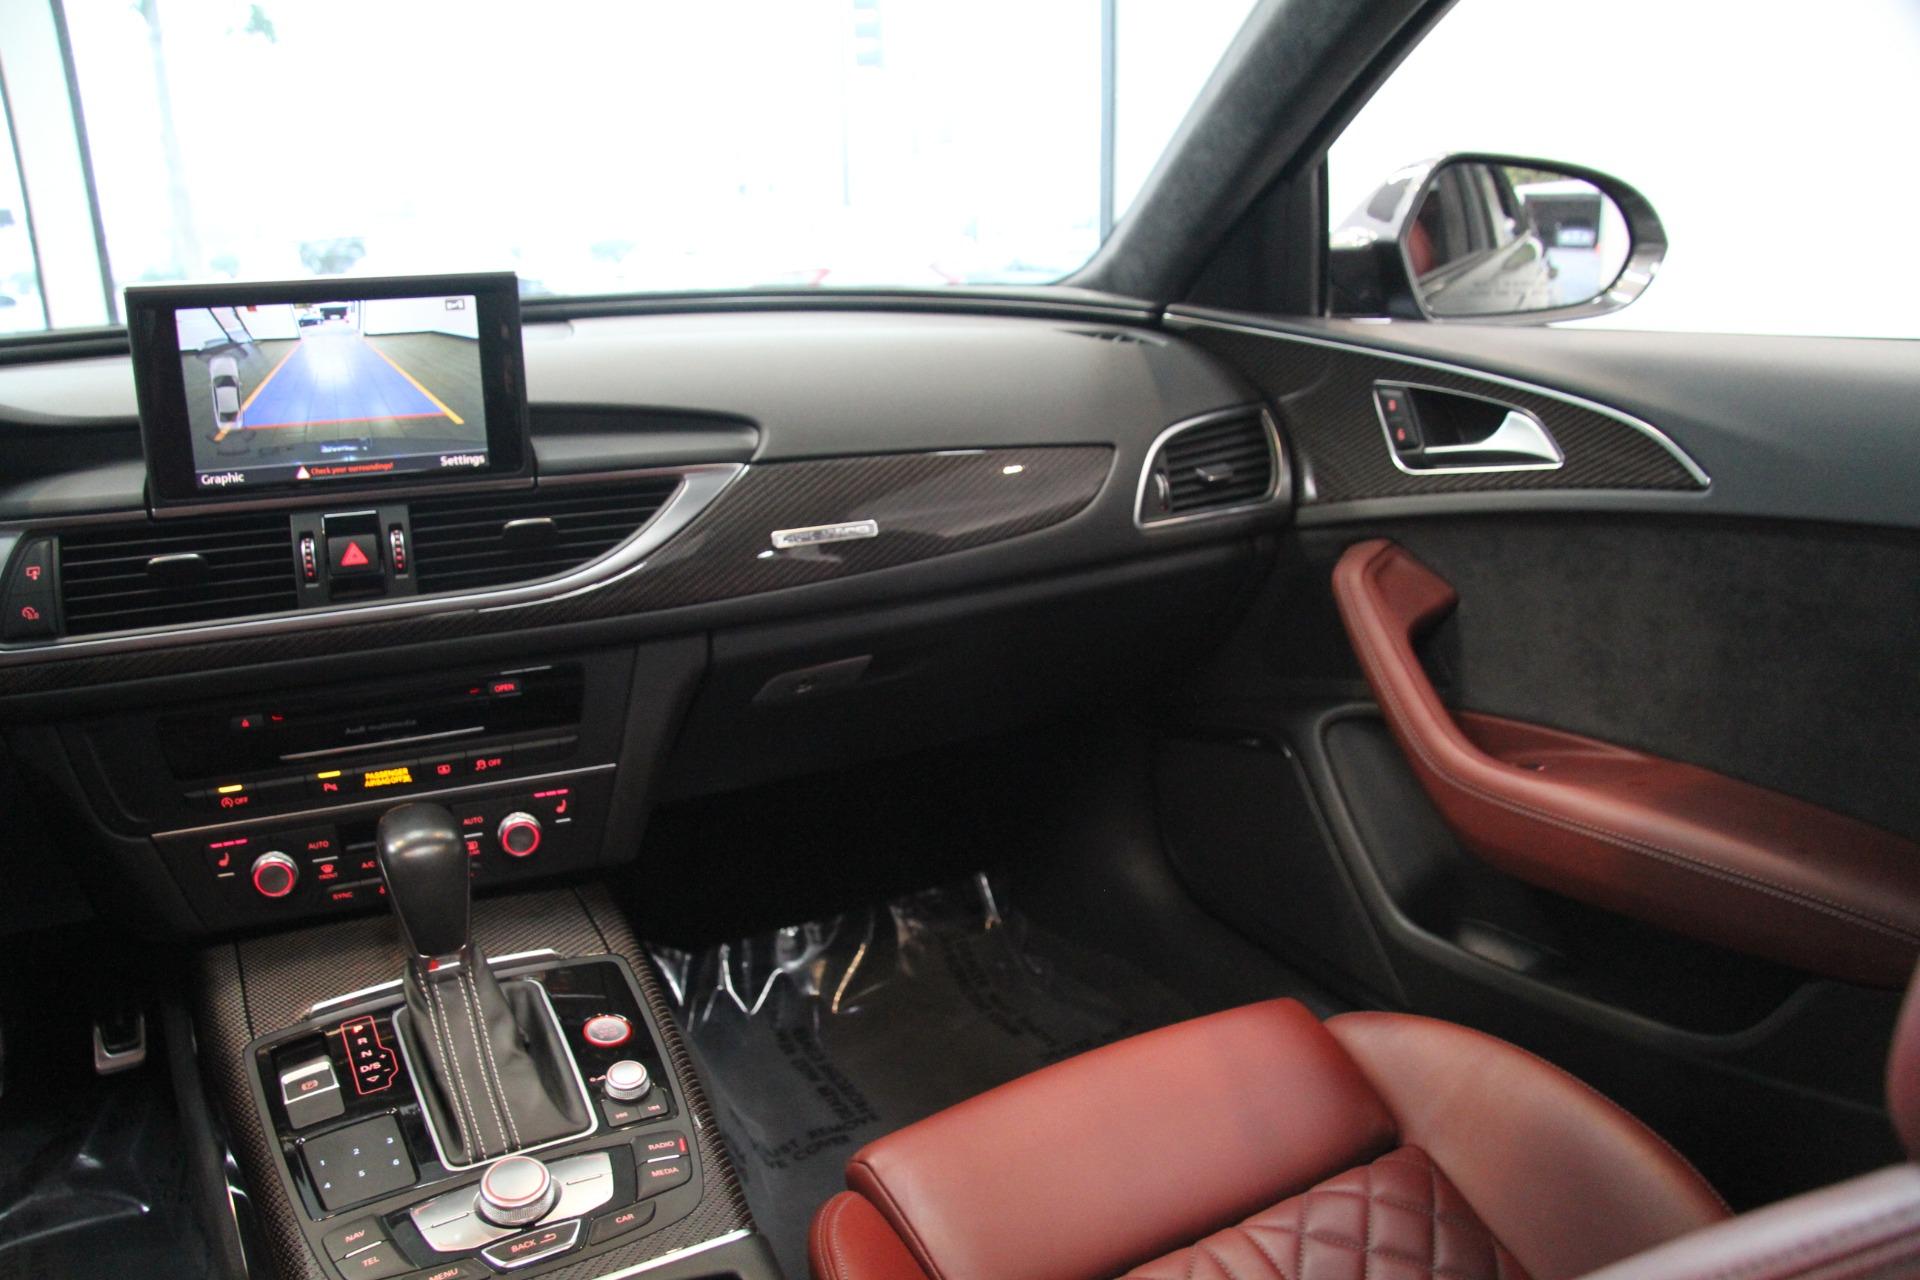 Used Audi For Sale Near Me >> 2016 Audi S6 4.0T quattro Prestige Stock # 6102 for sale ...